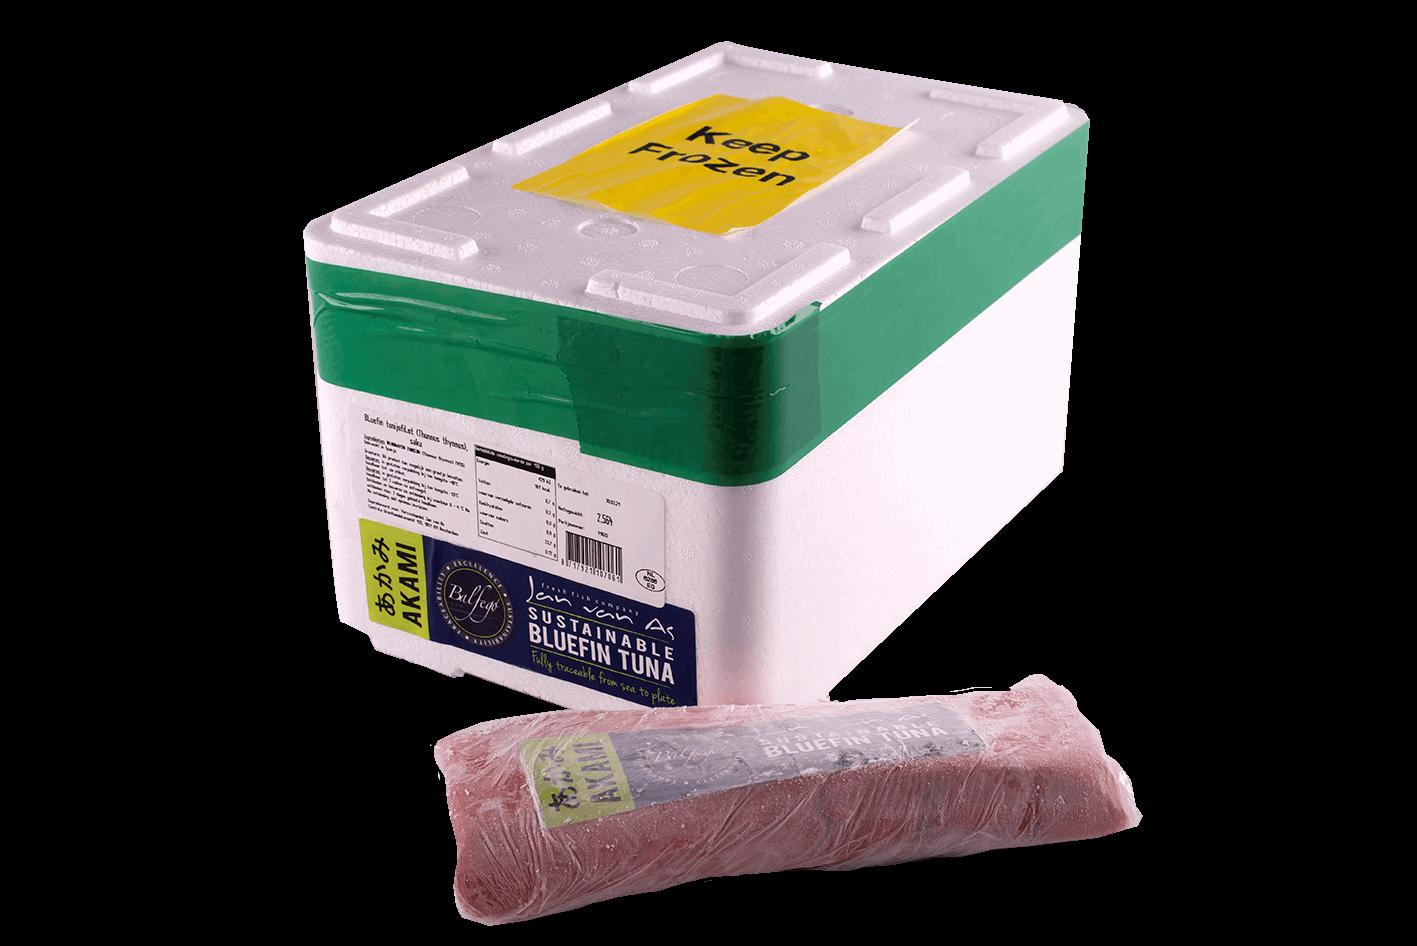 Productafbeelding Saku bluefin akami balfego shockfresh box circa. 2,5 kg